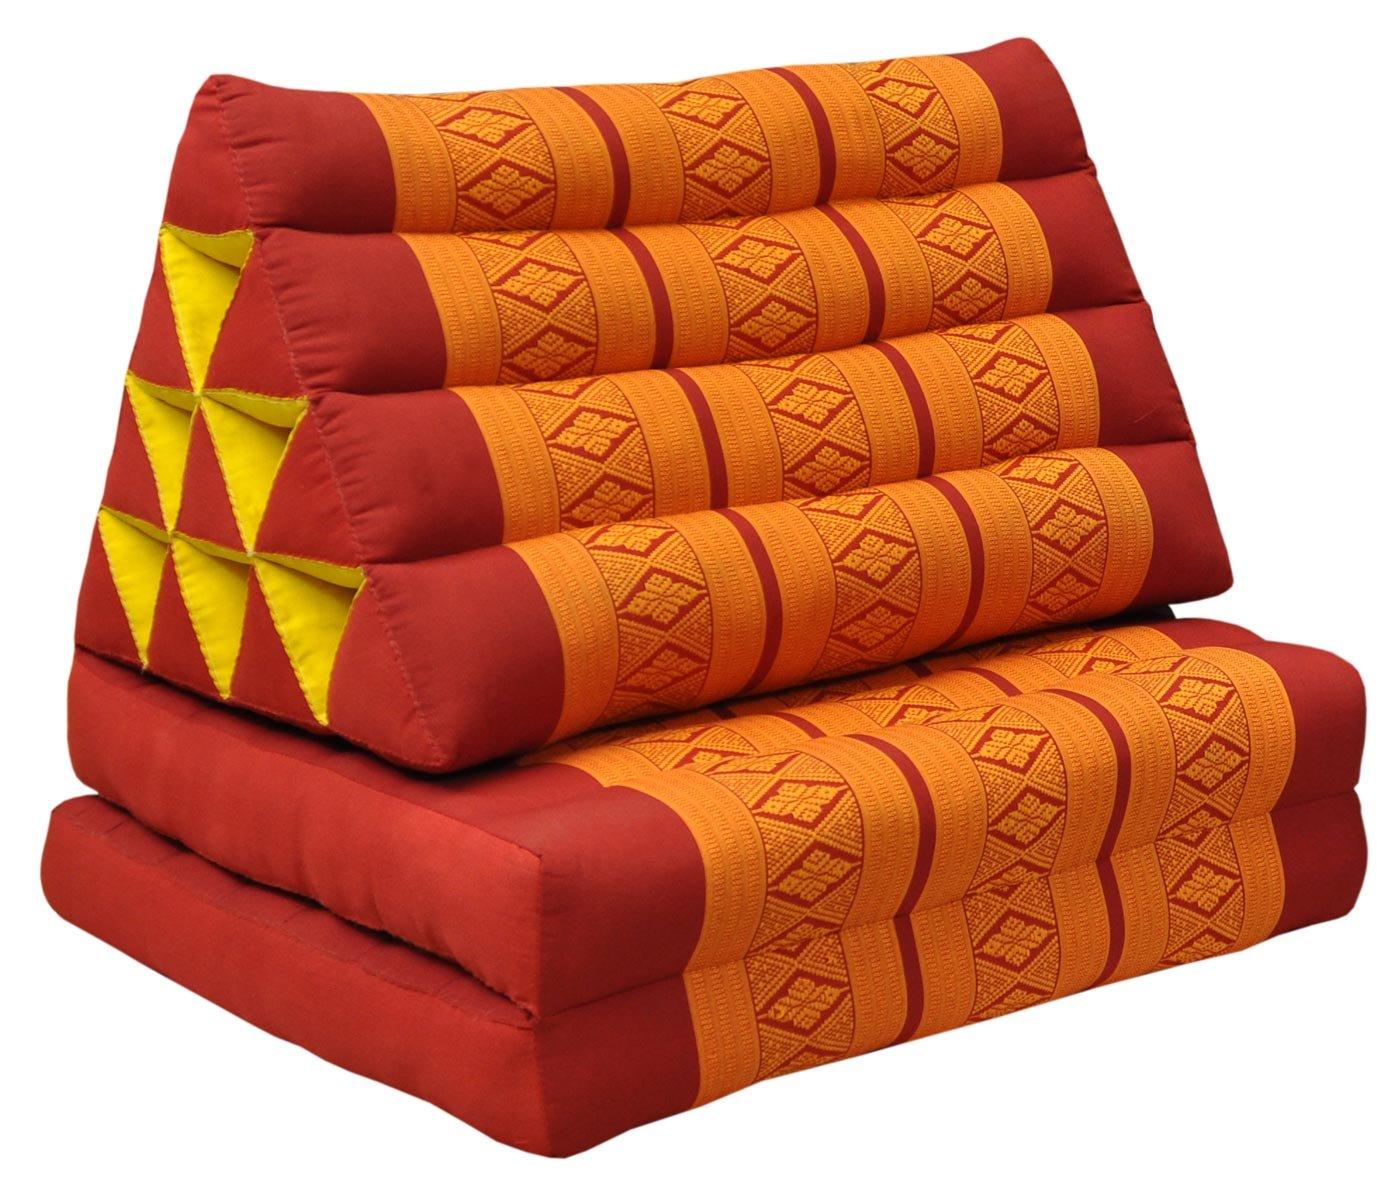 Thai triangular cushion with mattress 2 folds, red/orange, relaxation, beach, pool, meditation garden (81002)